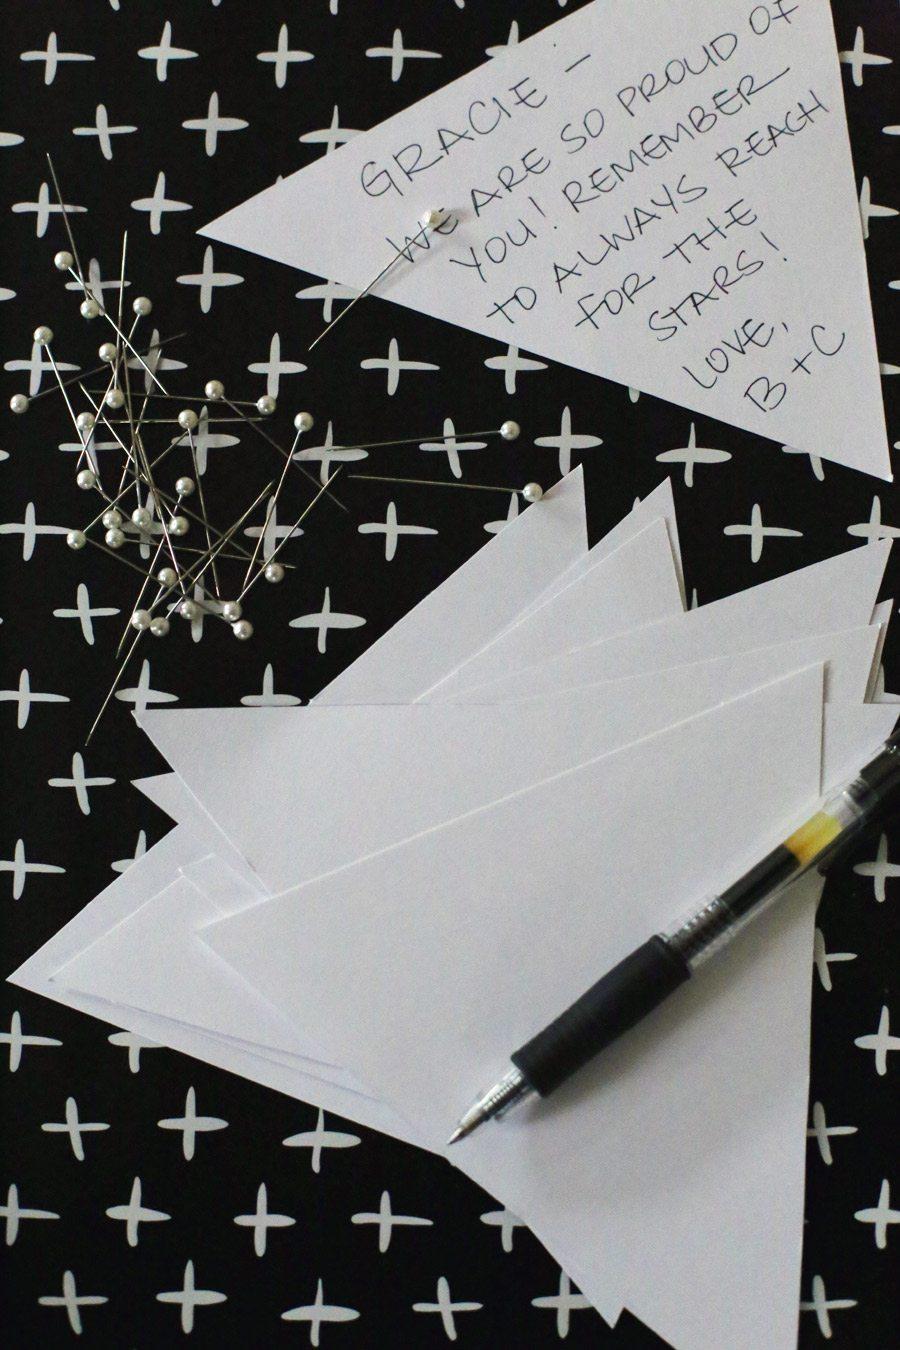 Graduation Cap Gumball Tube Gifts Free Printables Kara ... - photo#42